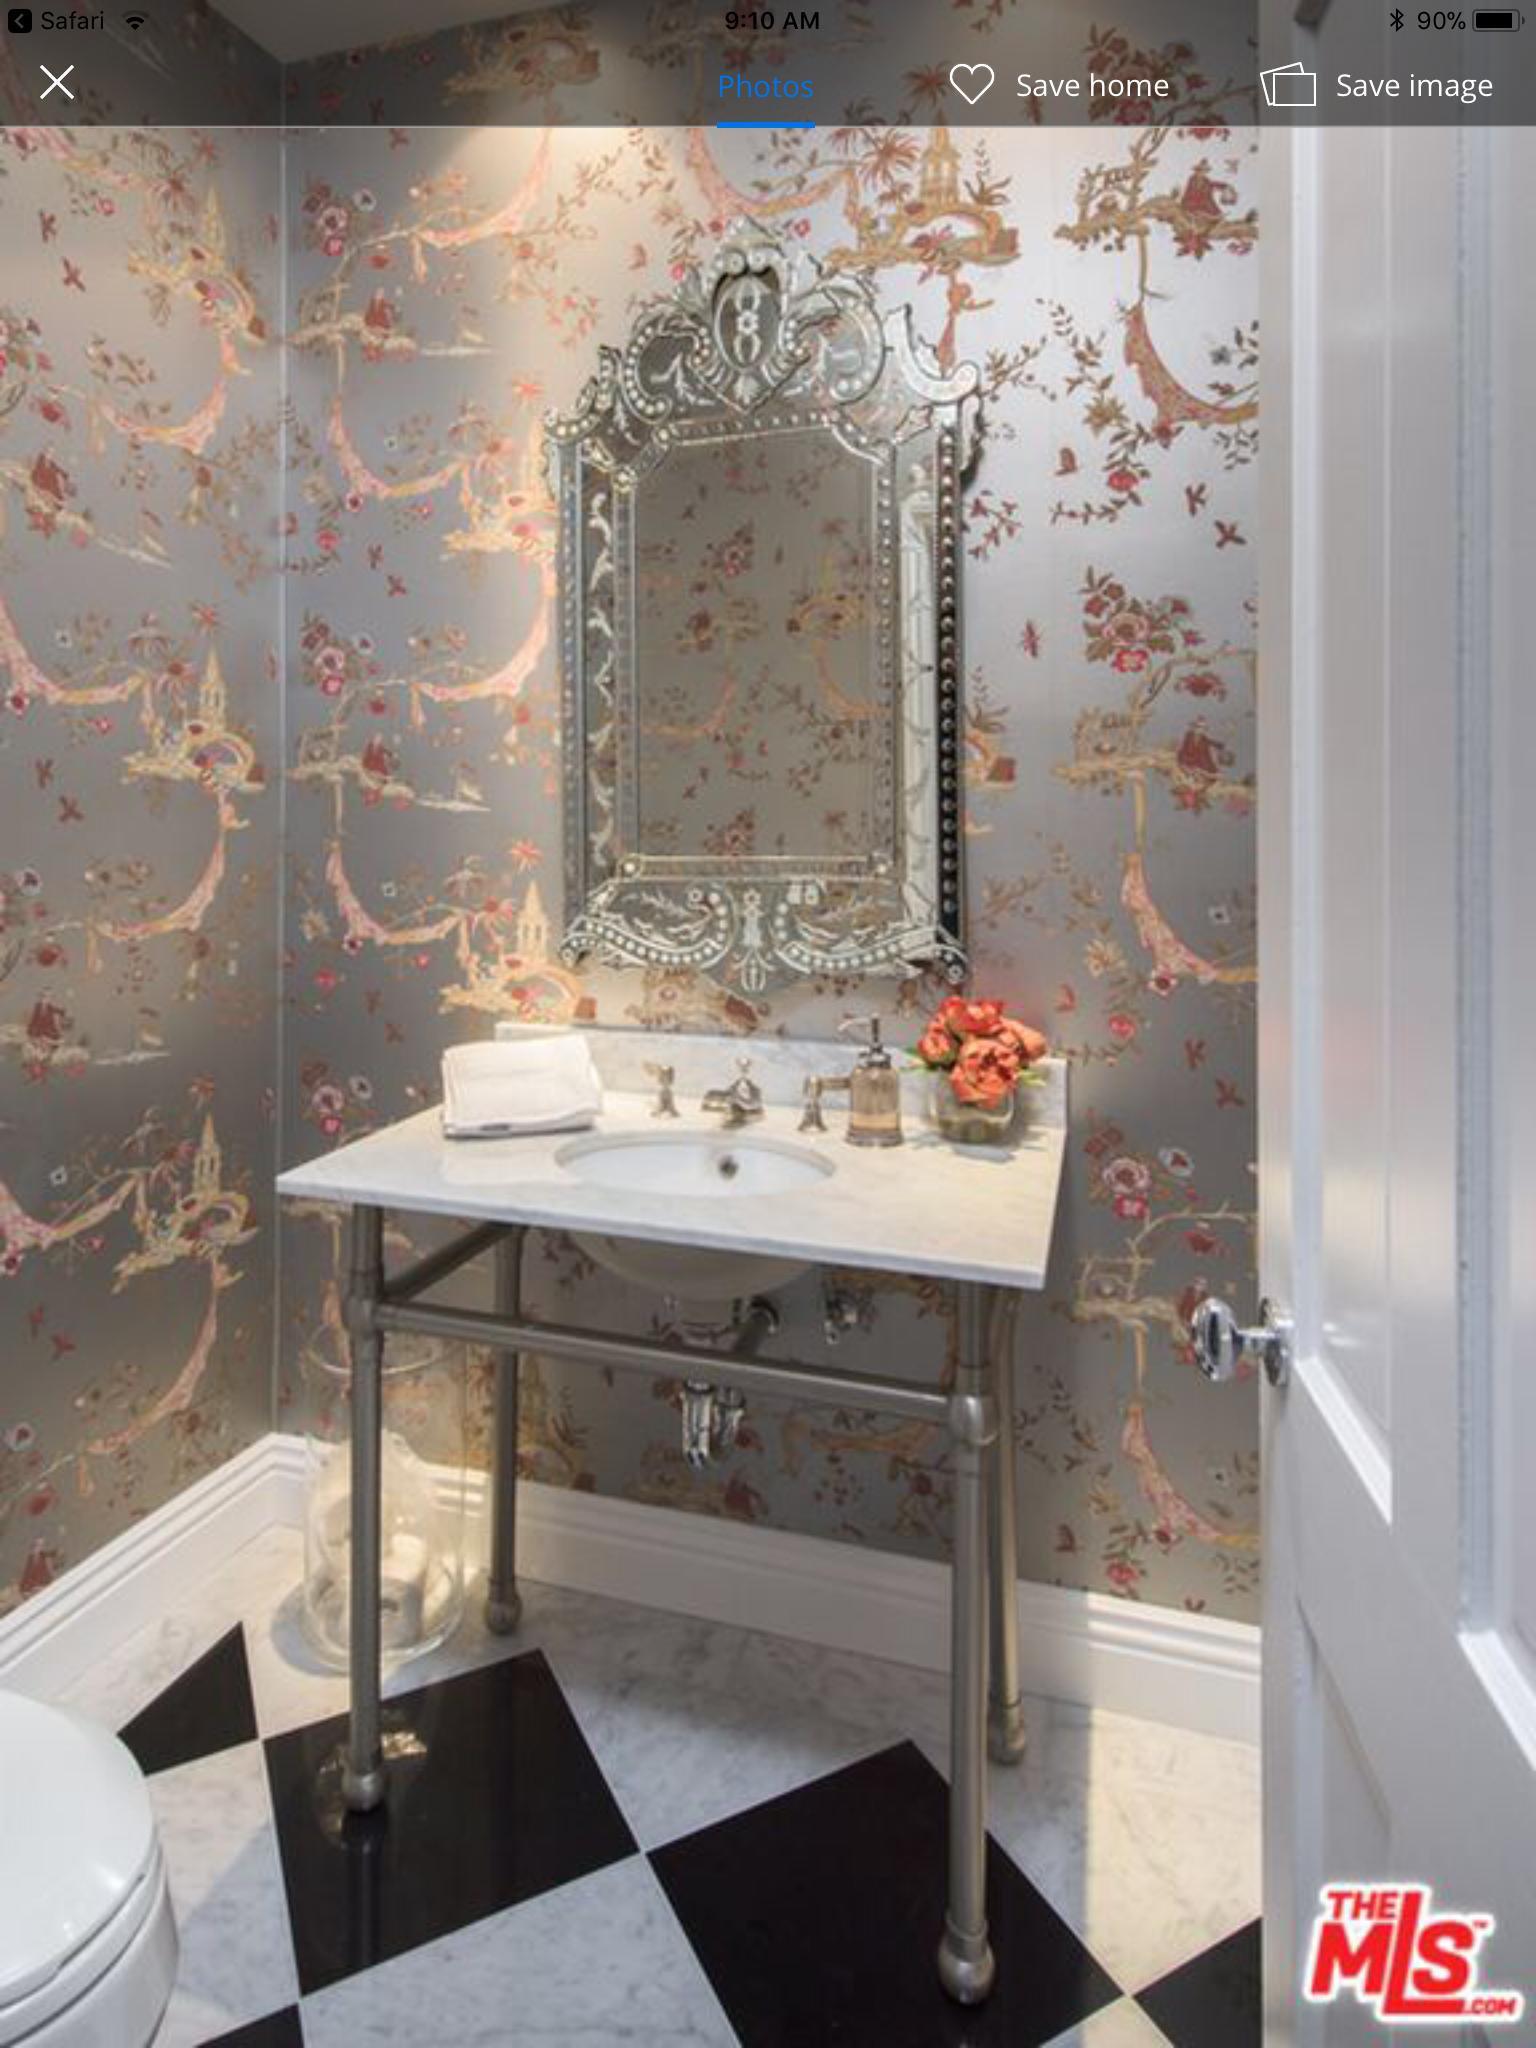 Wallpaper Kyle Richards Powder Room Bathroom Interior Design Bedroom Design Home Decor